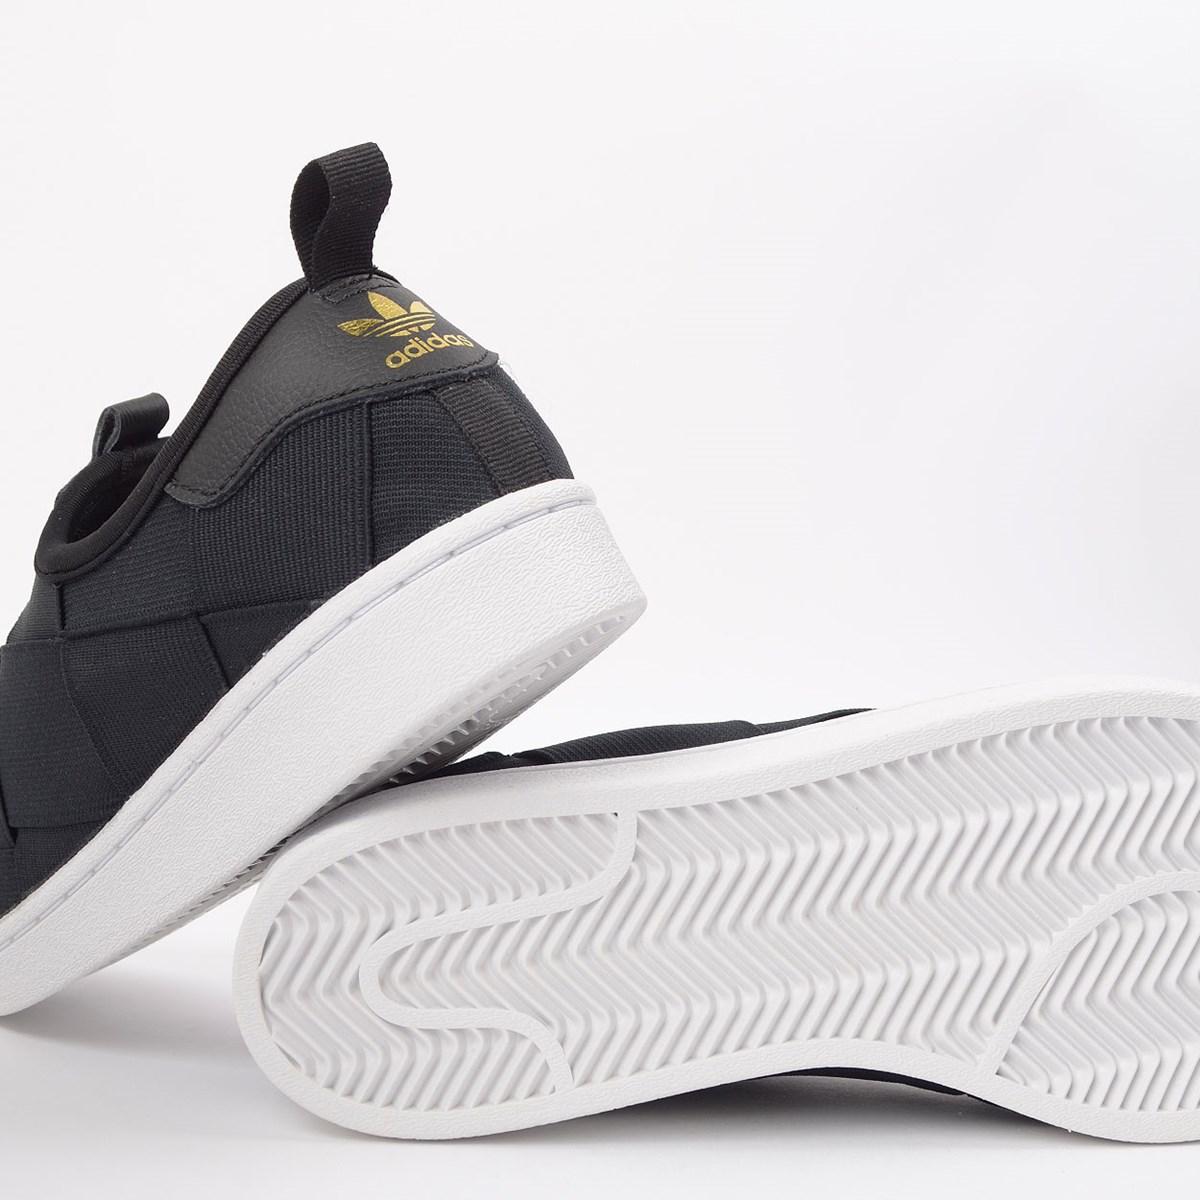 Tênis adidas Superstar Slip On W Core Black Fwtr White EX1872